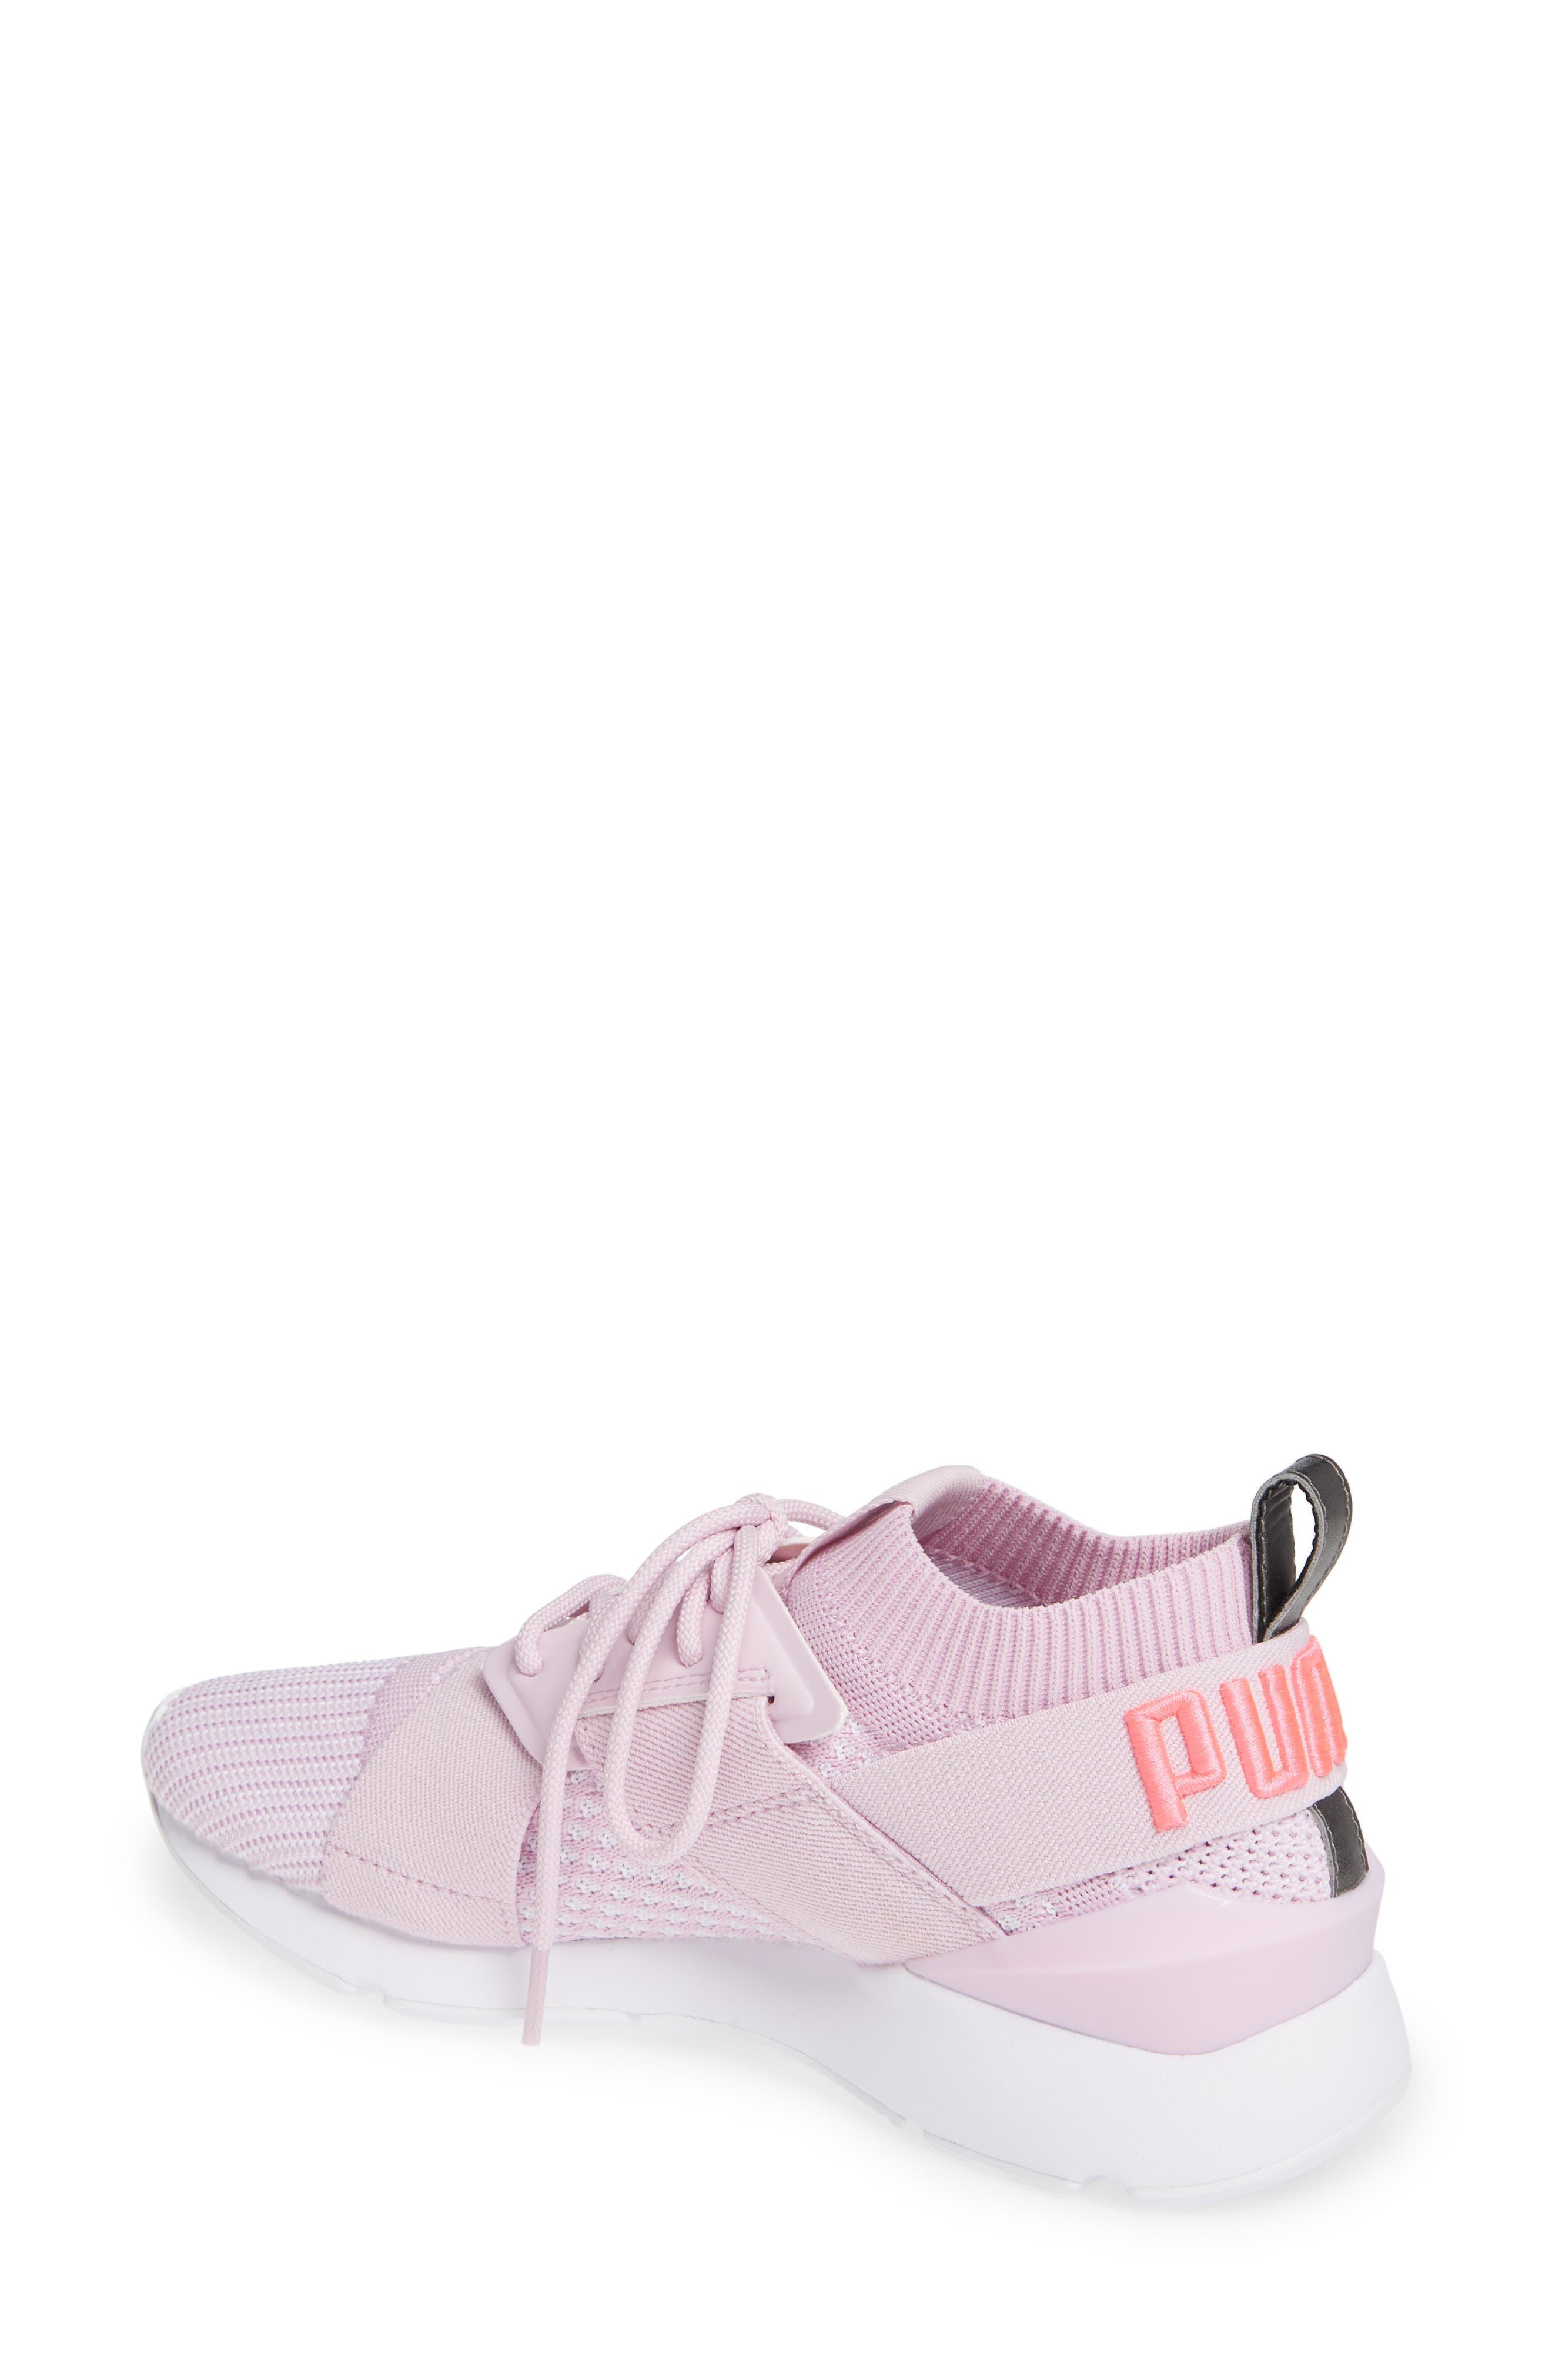 Muse EvoKNIT Sneaker,                             Alternate thumbnail 2, color,                             500